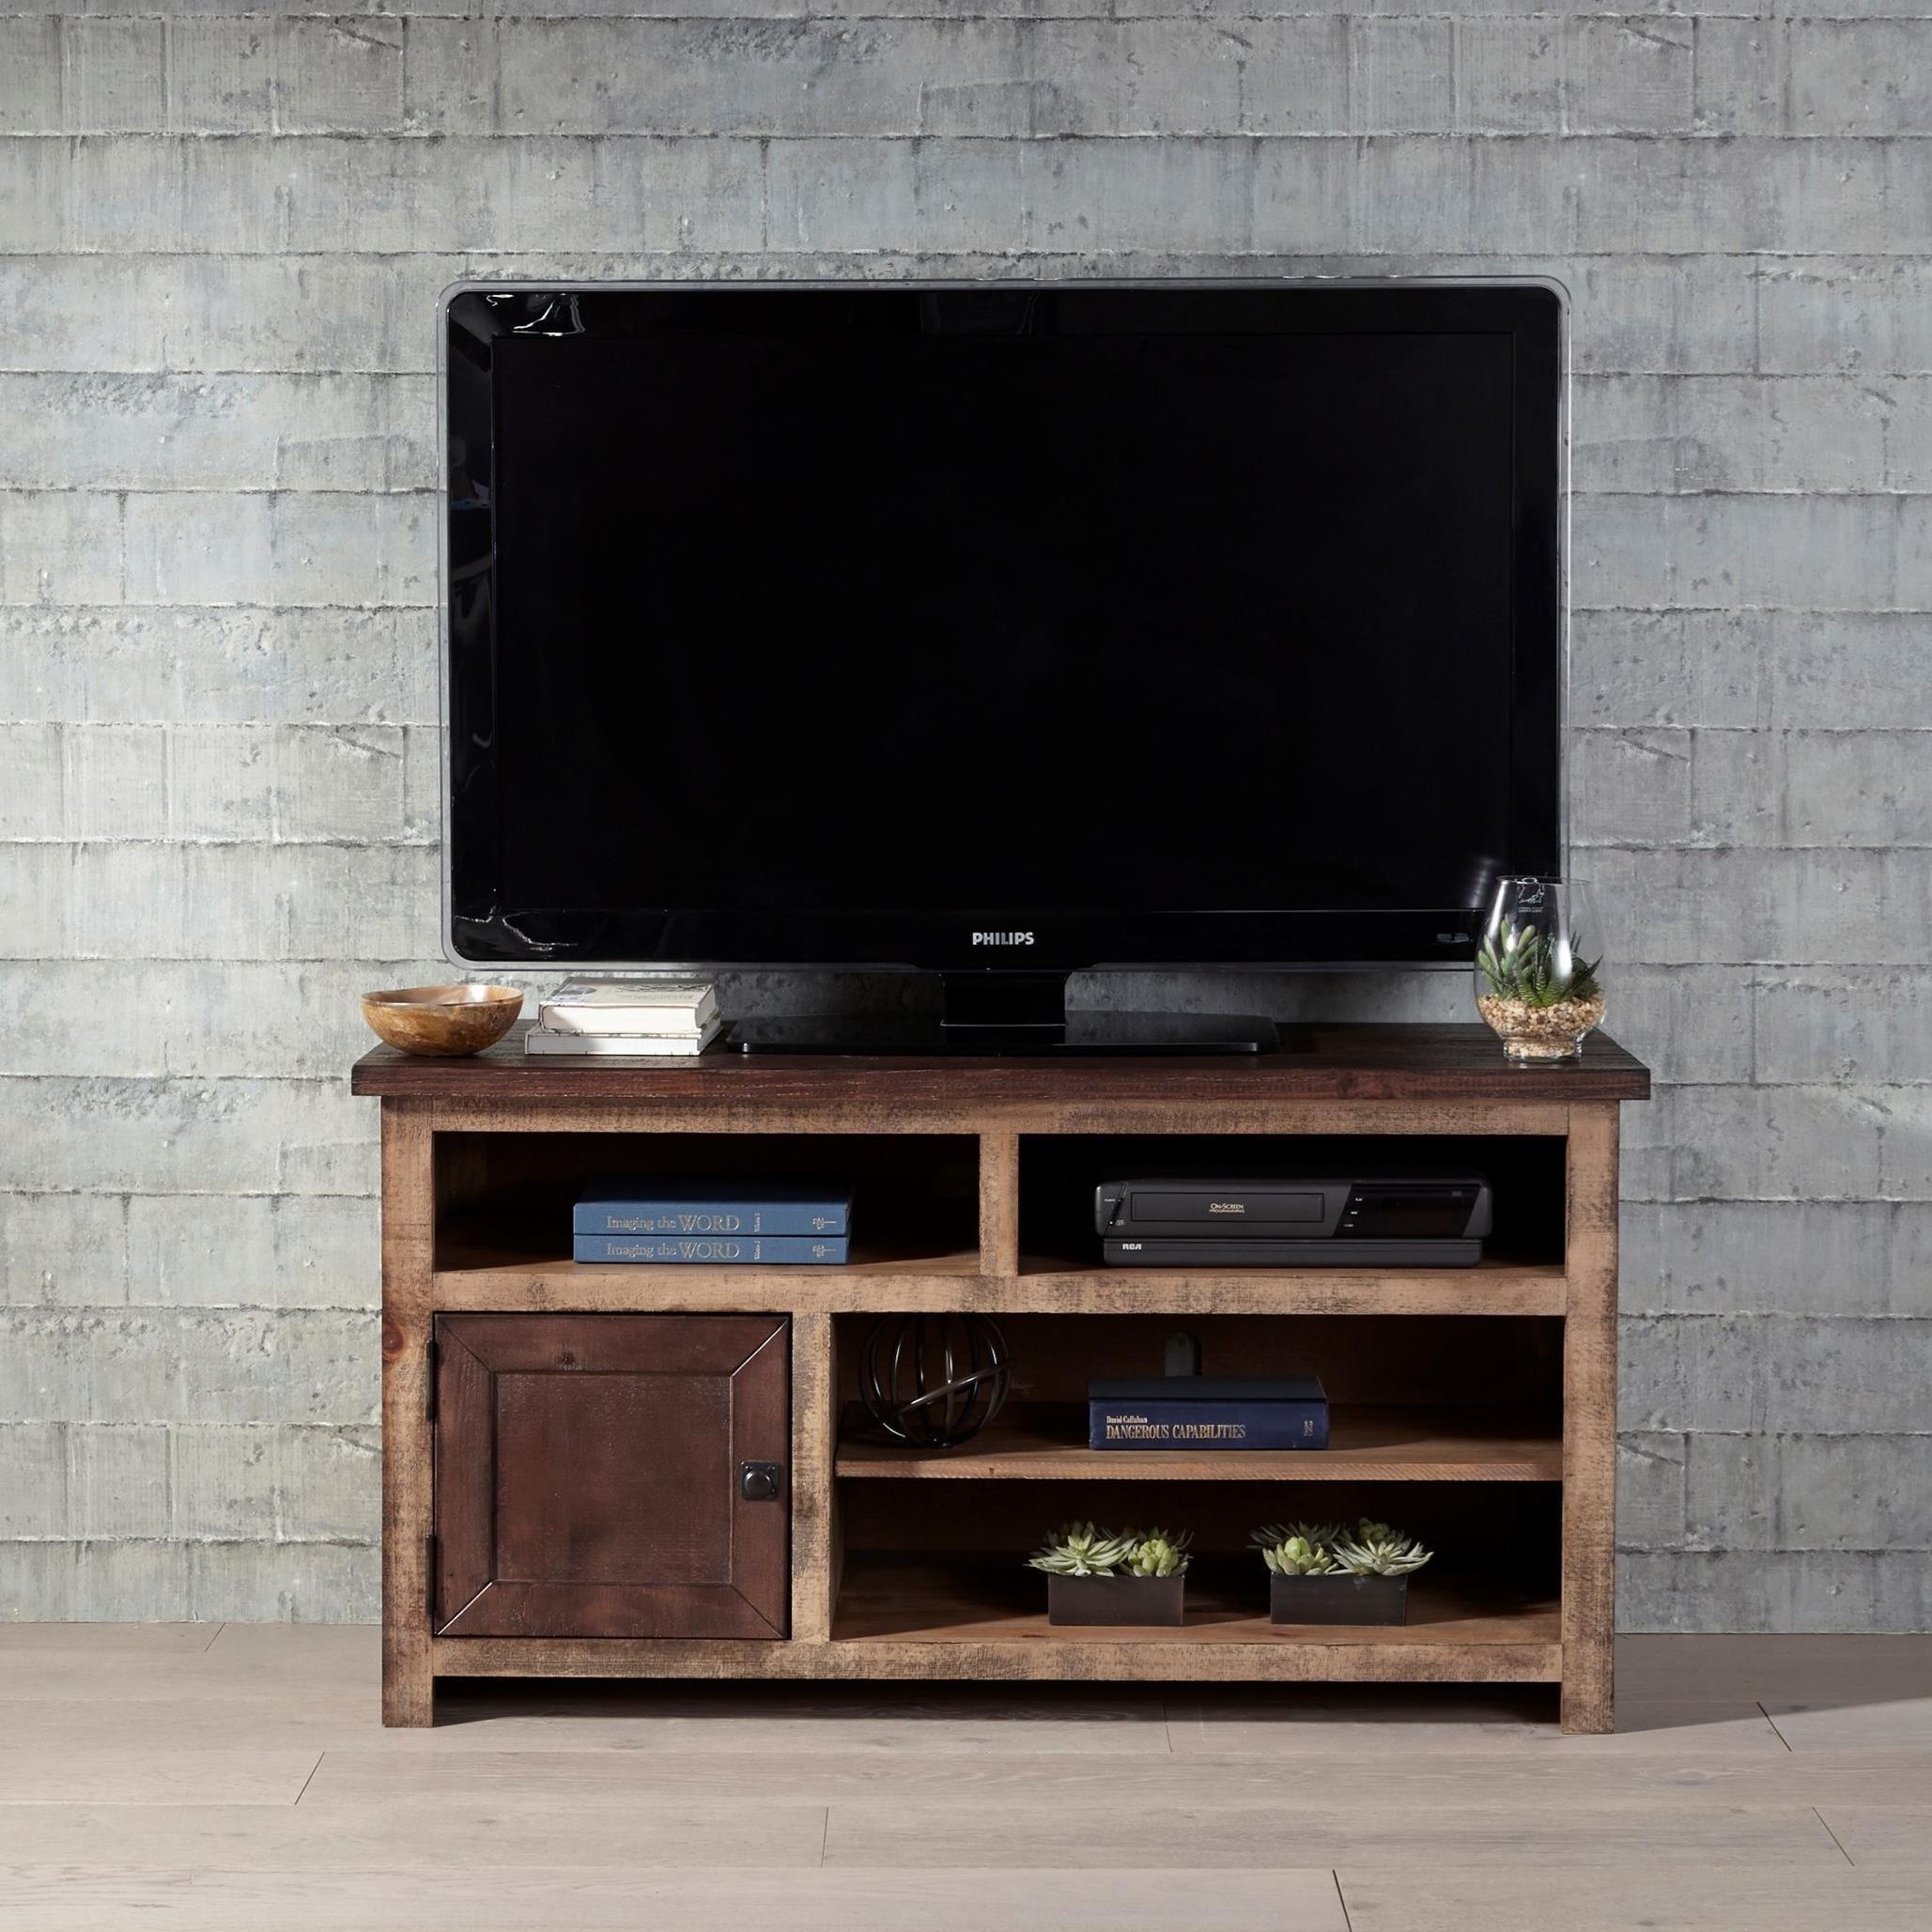 Progressive Furniture Trilogy 50 Inch Console - Item Number: E633-50